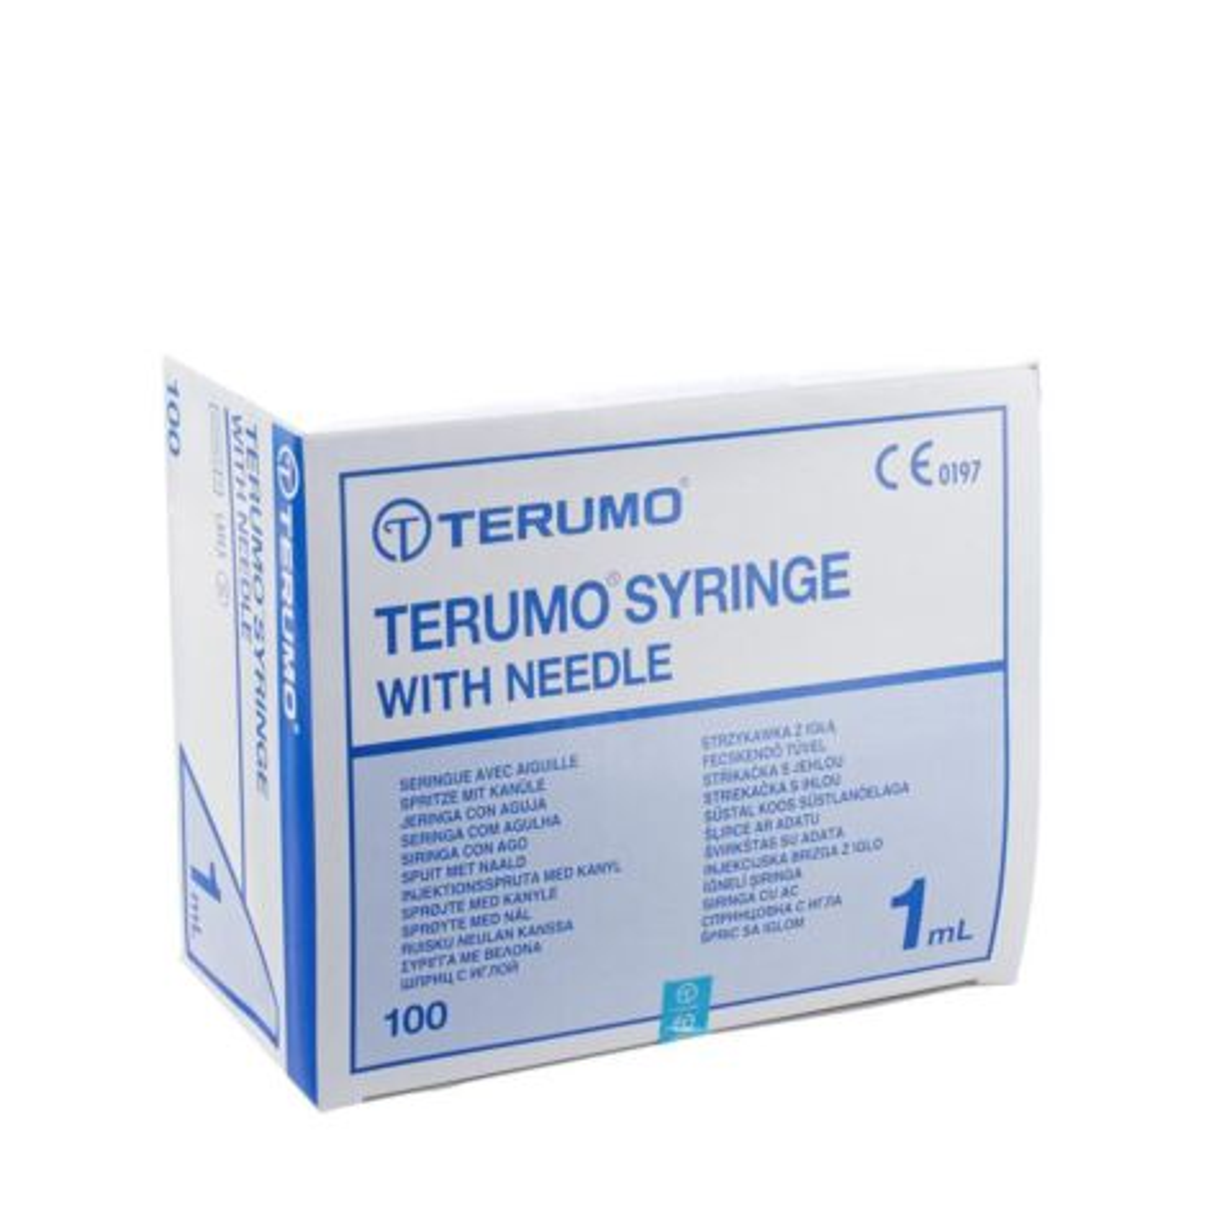 WWS-TUBERCULINE TERUMO M-NAALD 26G0,5 100ST